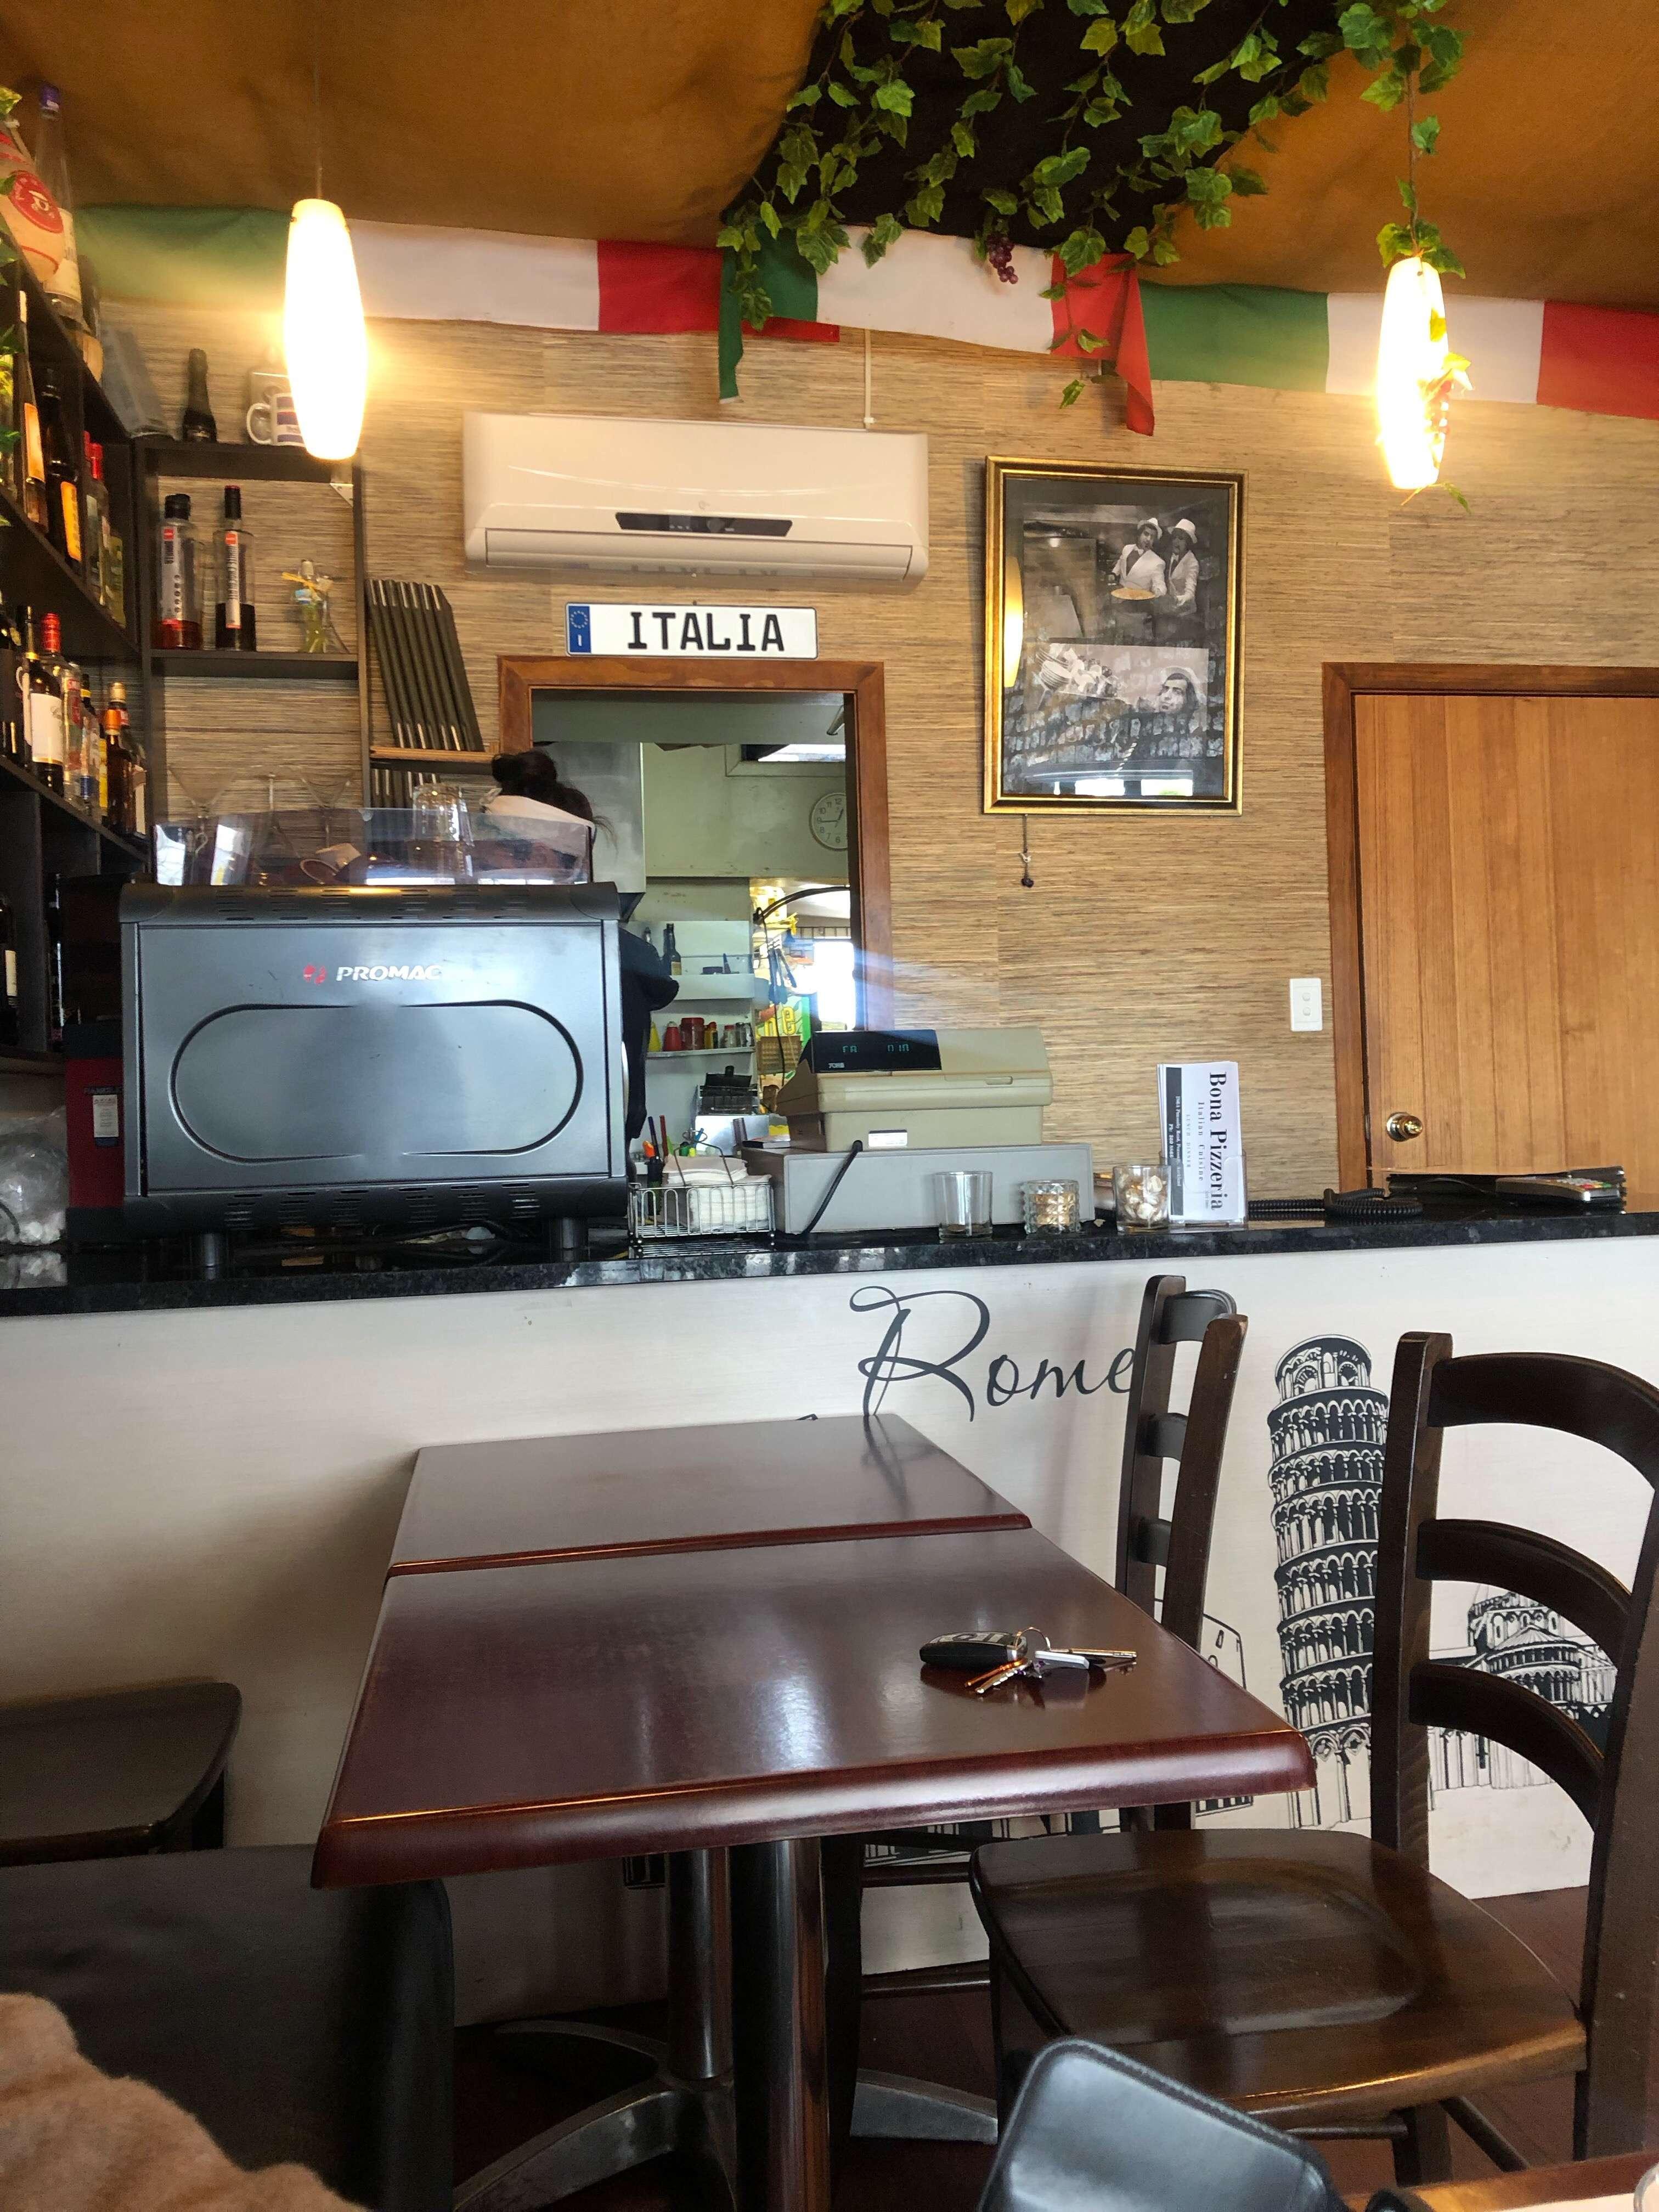 Bona Pizzeria